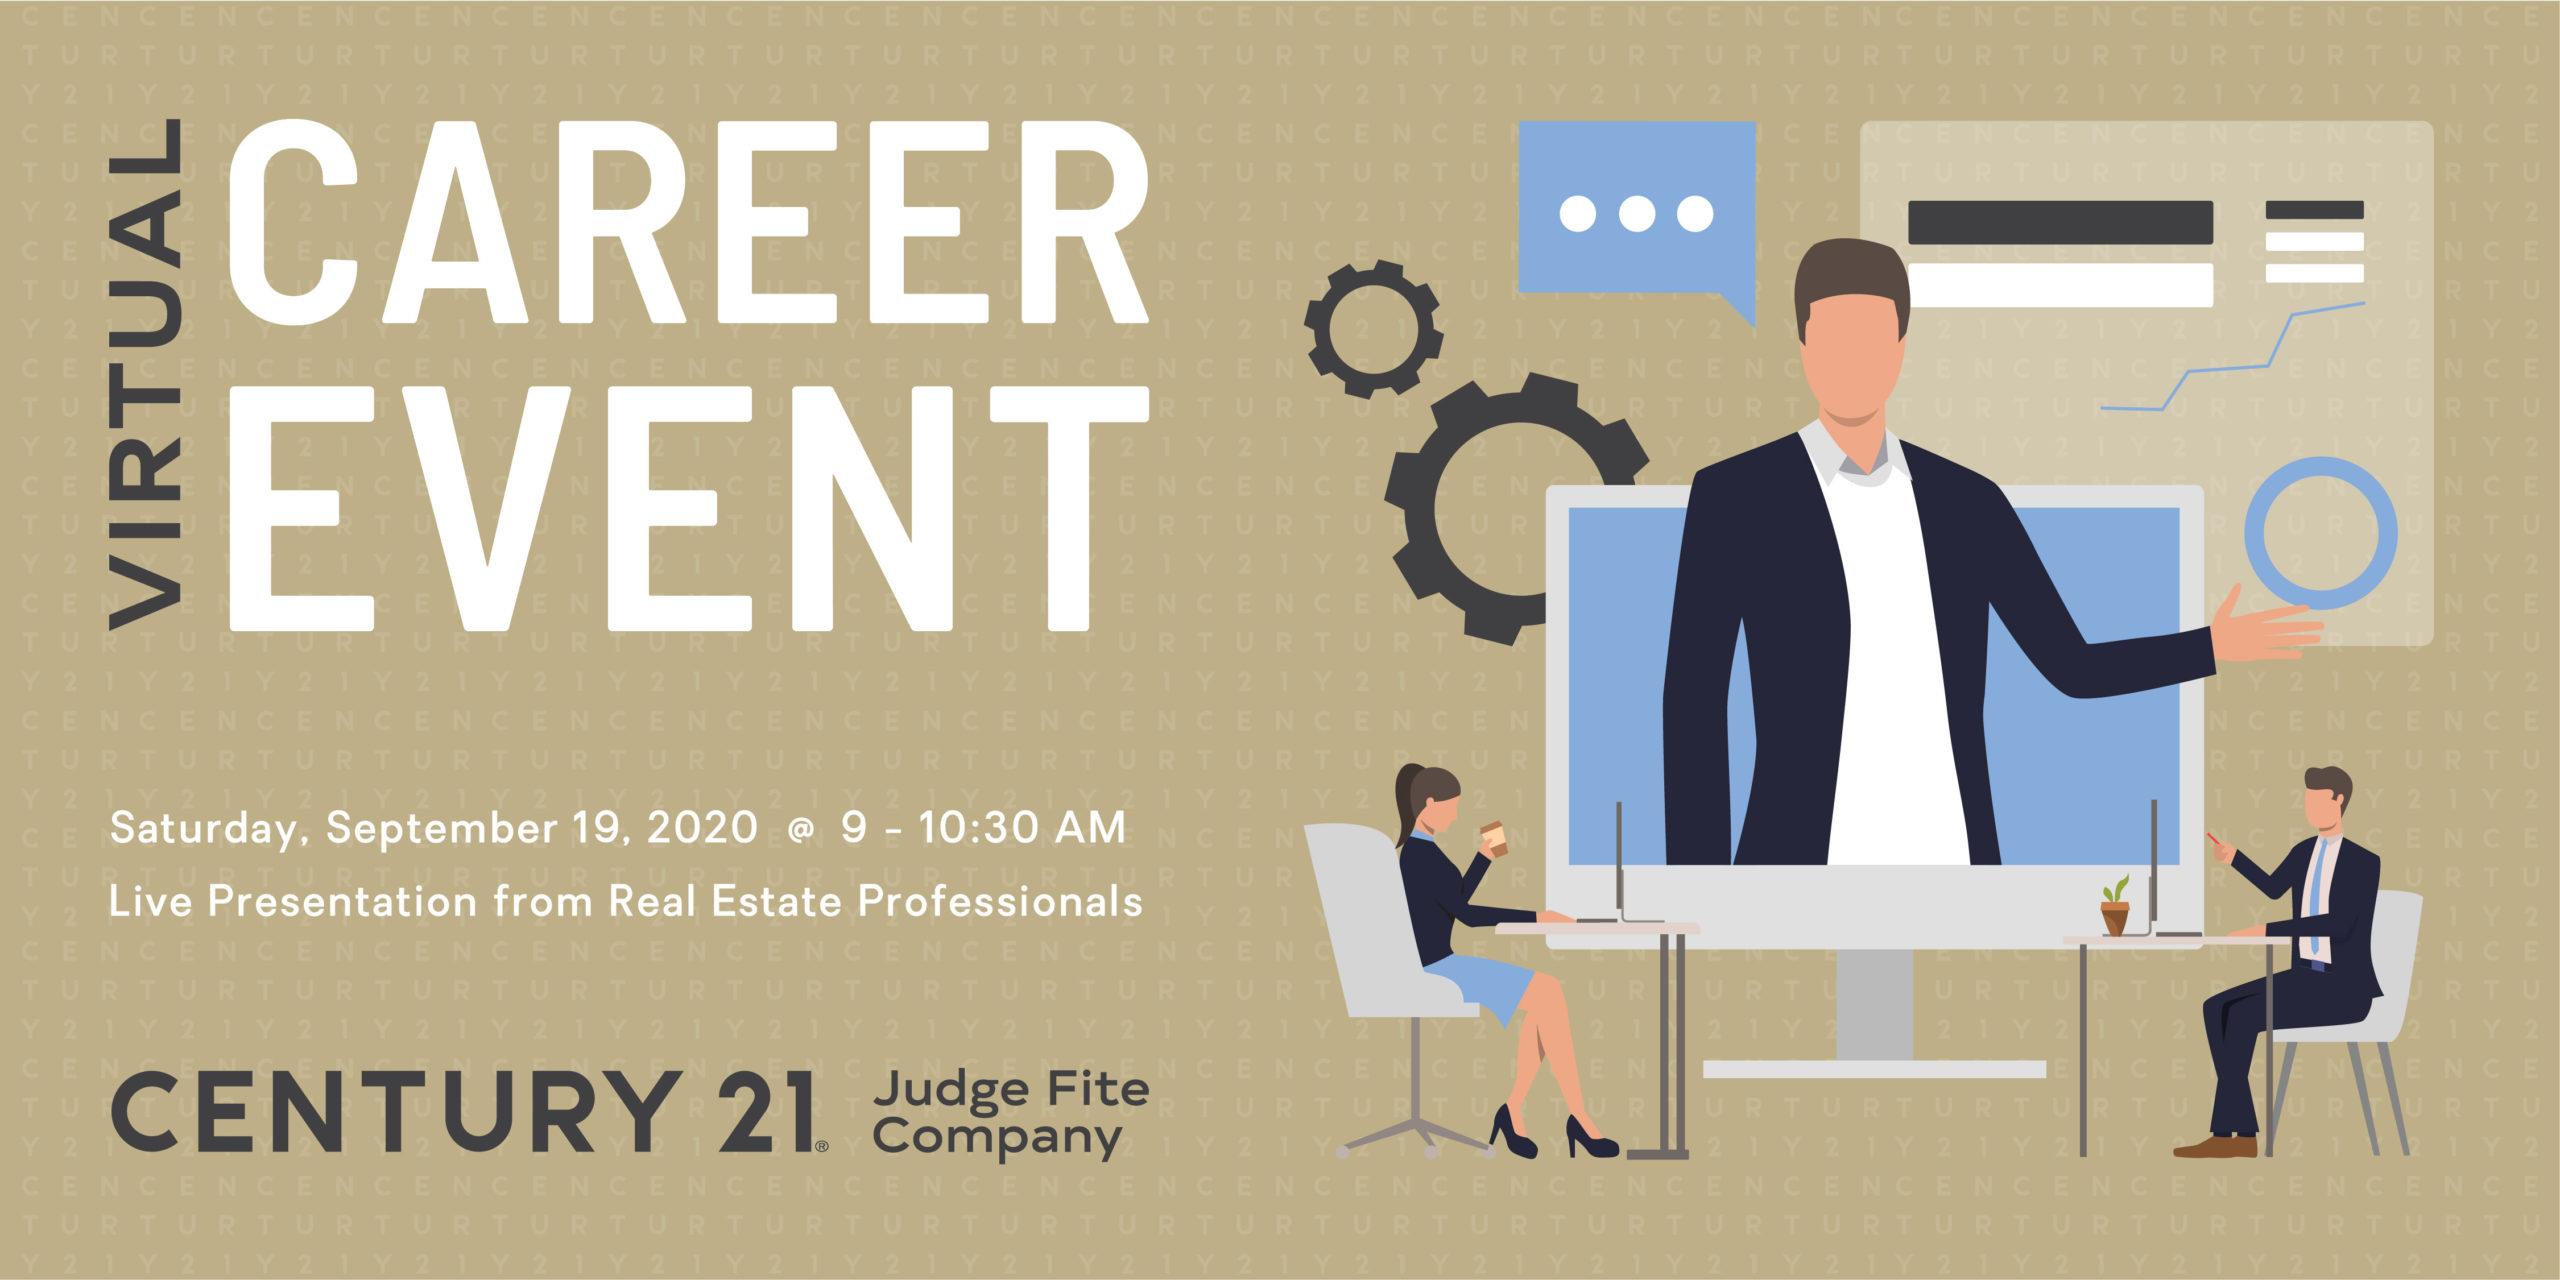 CENTURY 21 Judge Fite Company Virtual Career Event September 19, 2020